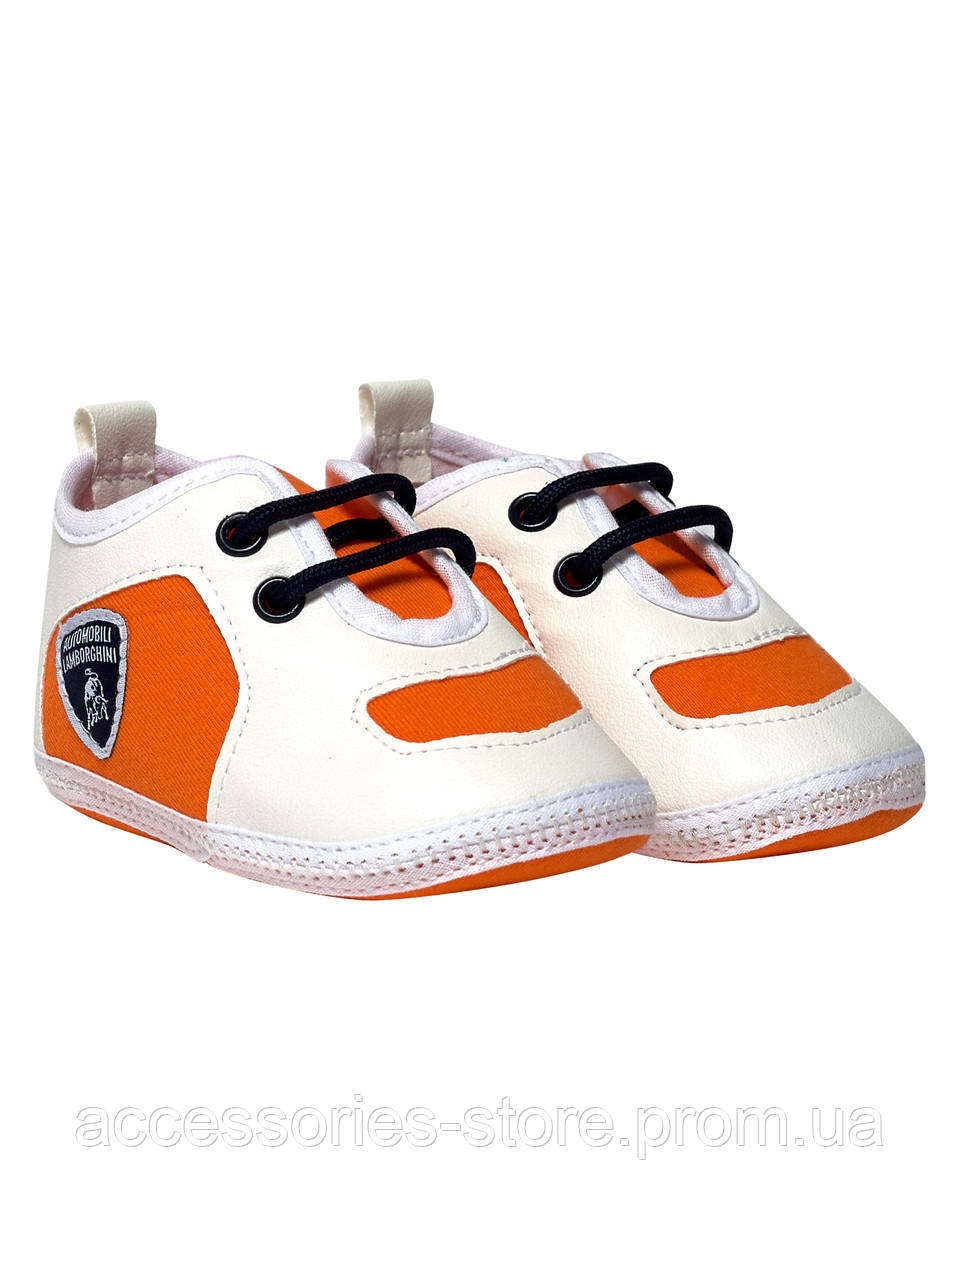 Обувь для детей Lamborghini Shield lace-up shoes, white/orange